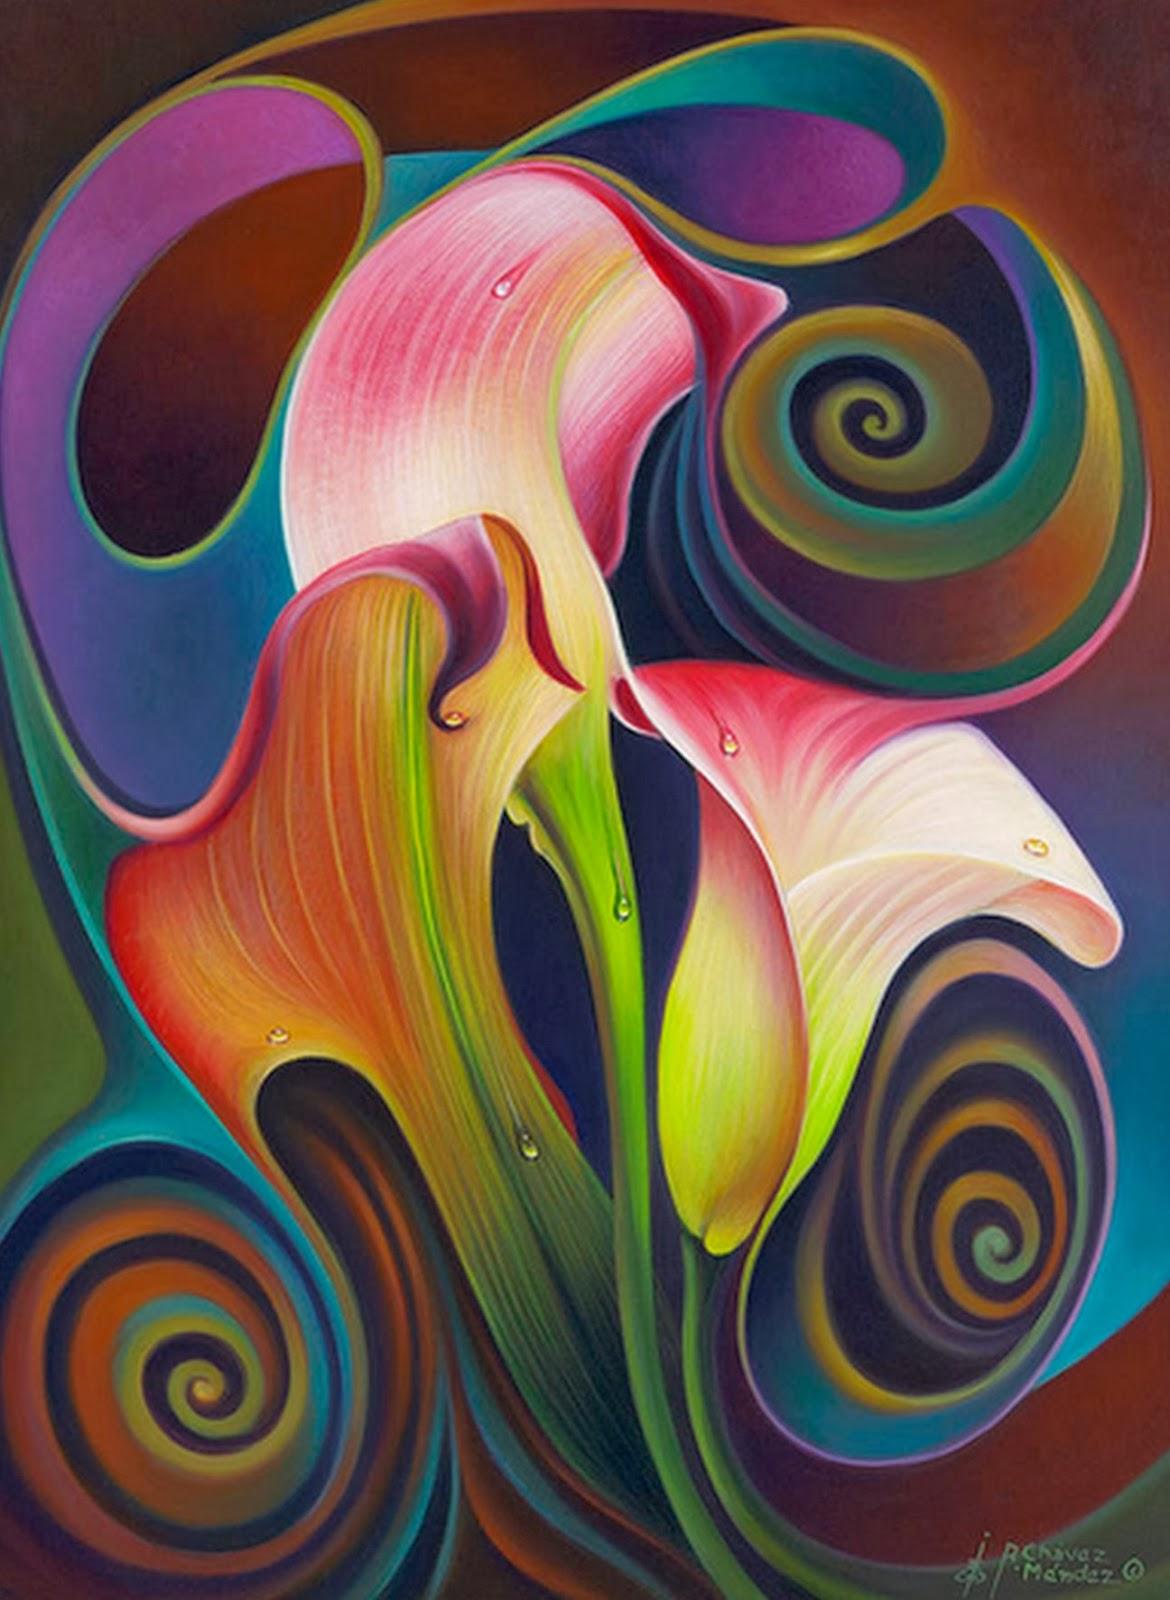 Cuadros modernos pinturas y dibujos cuadros de flores for Fotos cuadros abstractos modernos